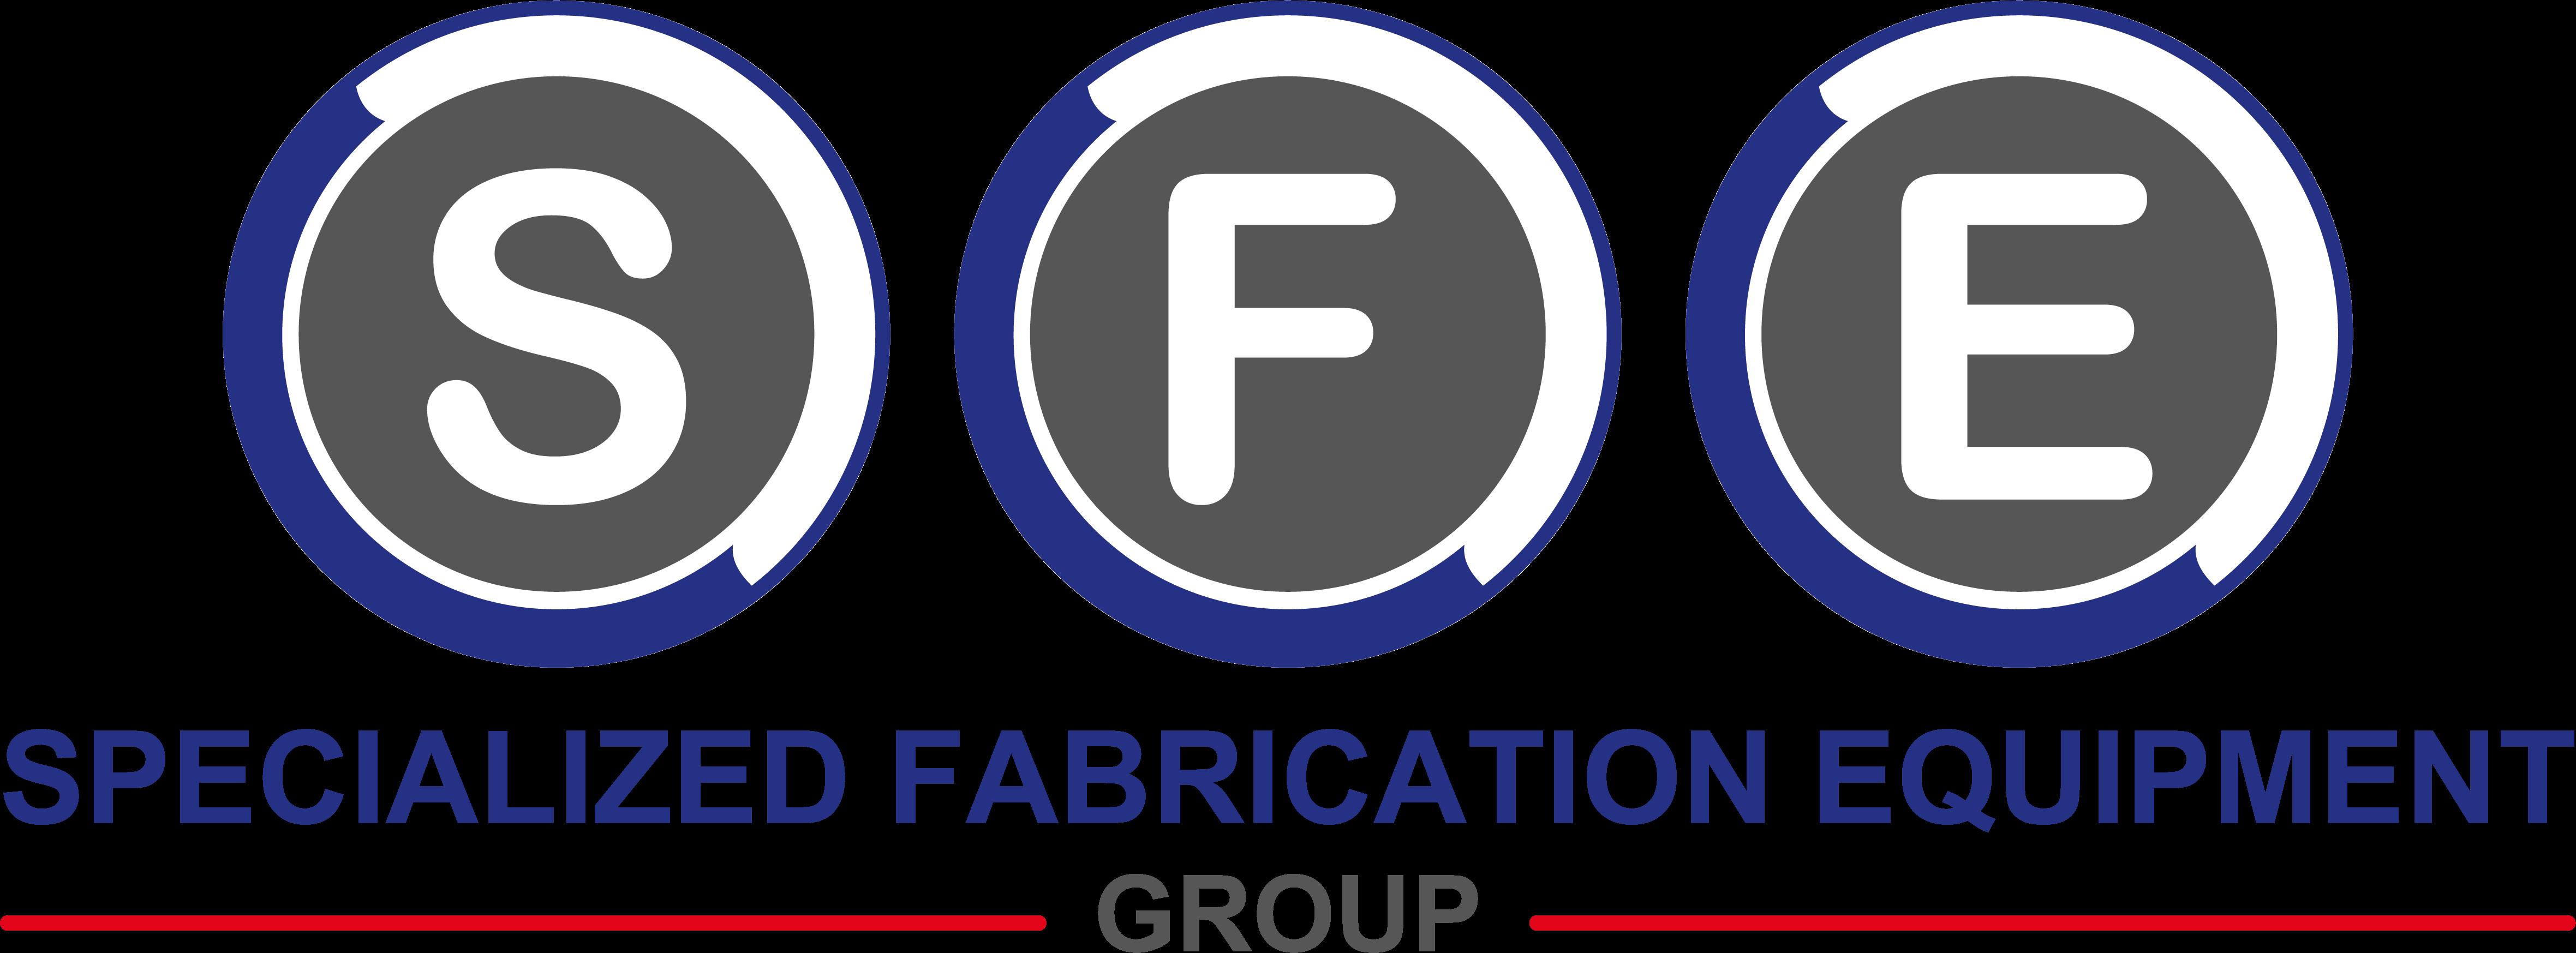 Specialized Fabrication Equipment Group, LLC Logo